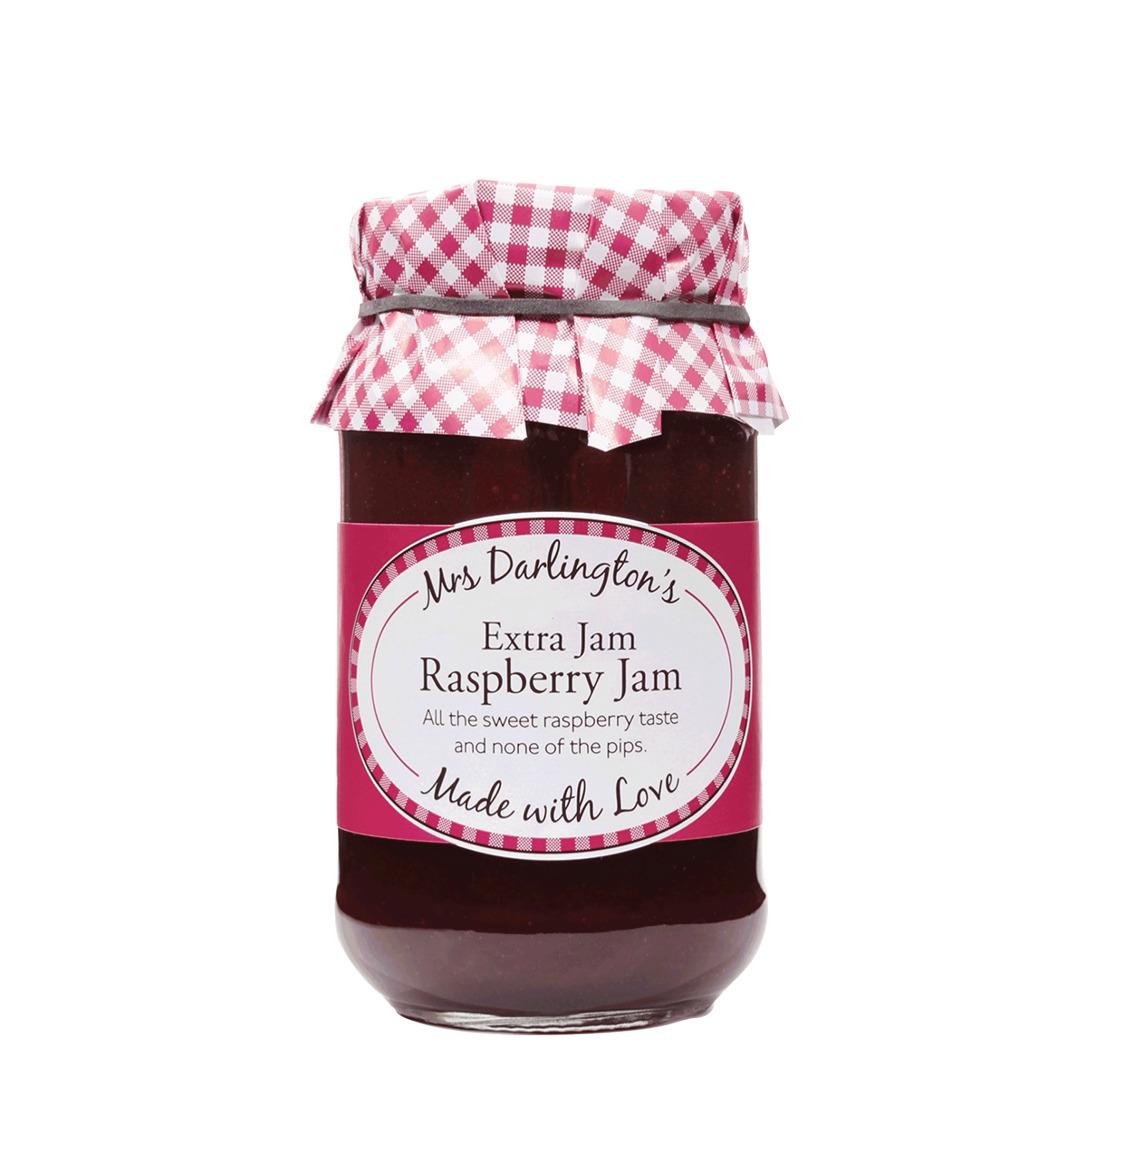 Mrs_Darlington's_Extra_Jam_Raspberry_Jam_The_Project_Garments_A